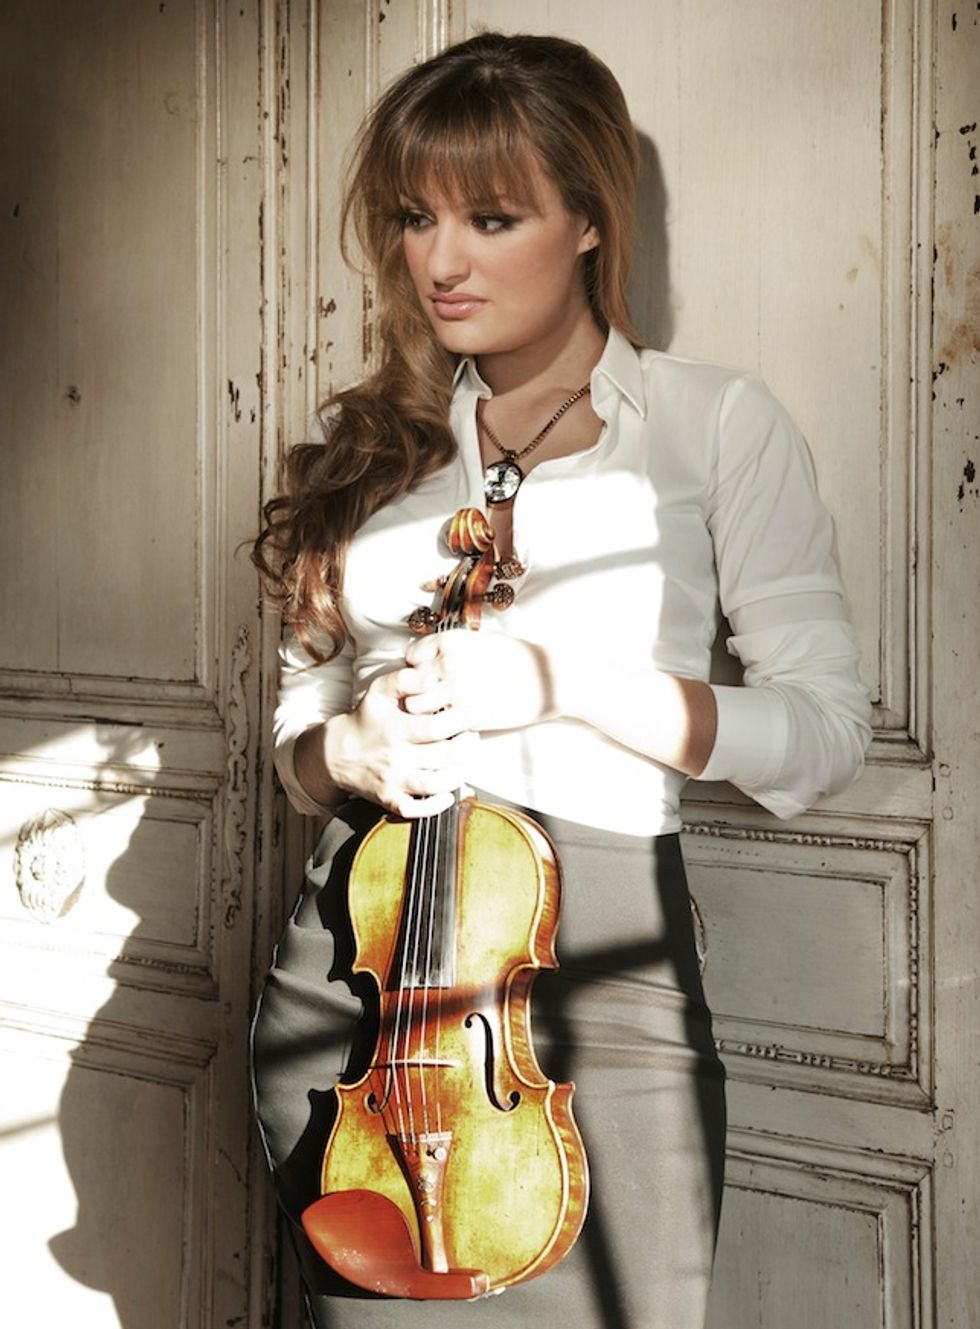 A Scottish Violinist Tells Us About Edinburgh's Music and Nightlife Scenes